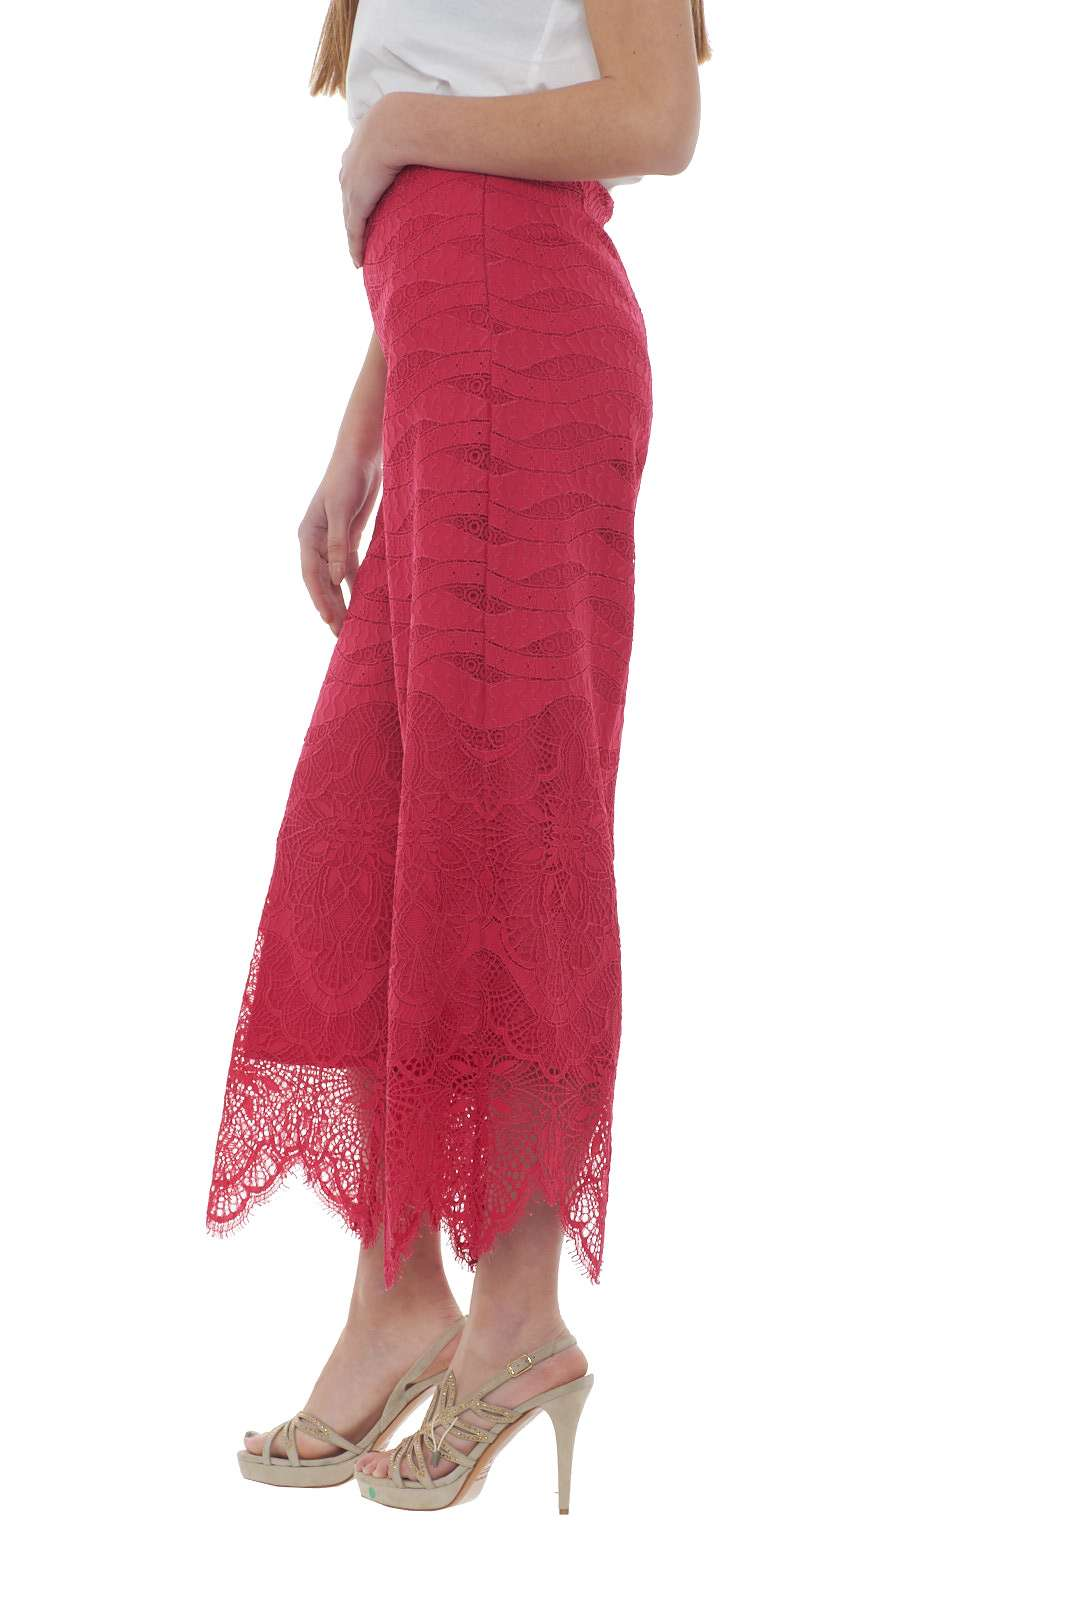 https://www.parmax.com/media/catalog/product/a/i/PE-outlet_parmax-pantaloni-donna-TwinSet-201TP2033-B.jpg